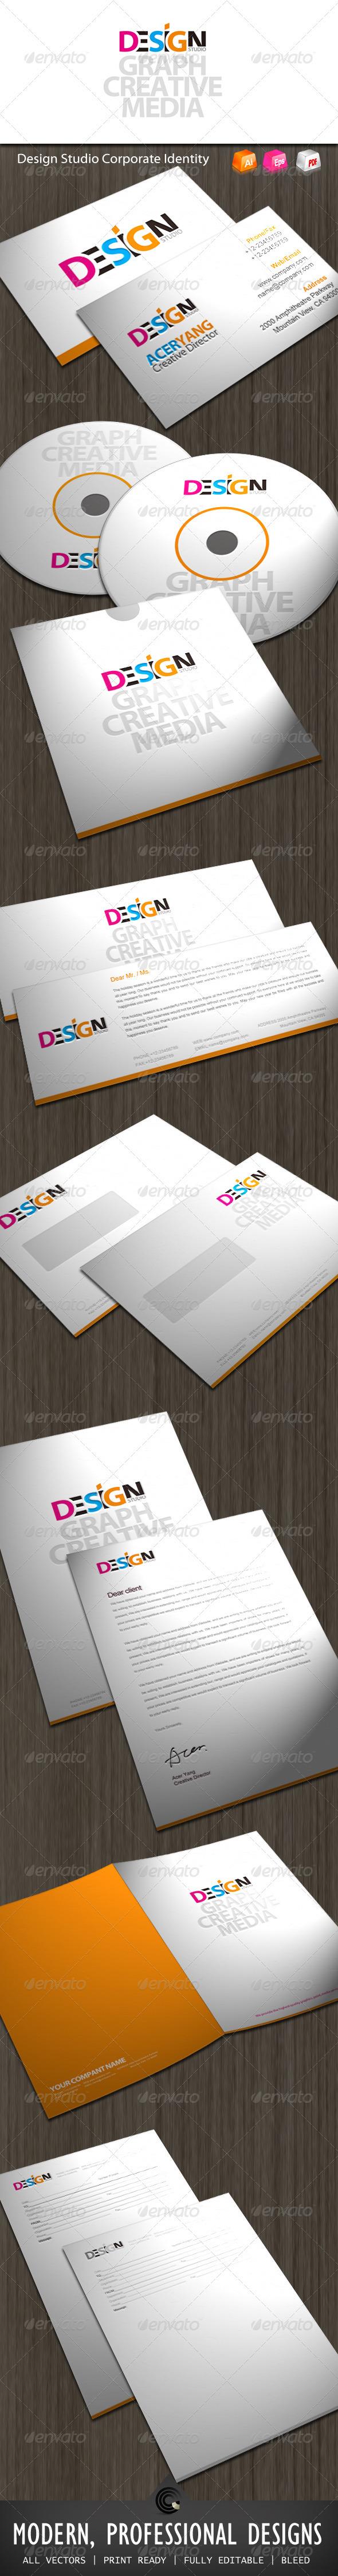 Graphic River Design Studio Corporate Identity Print Templates -  Stationery 545567